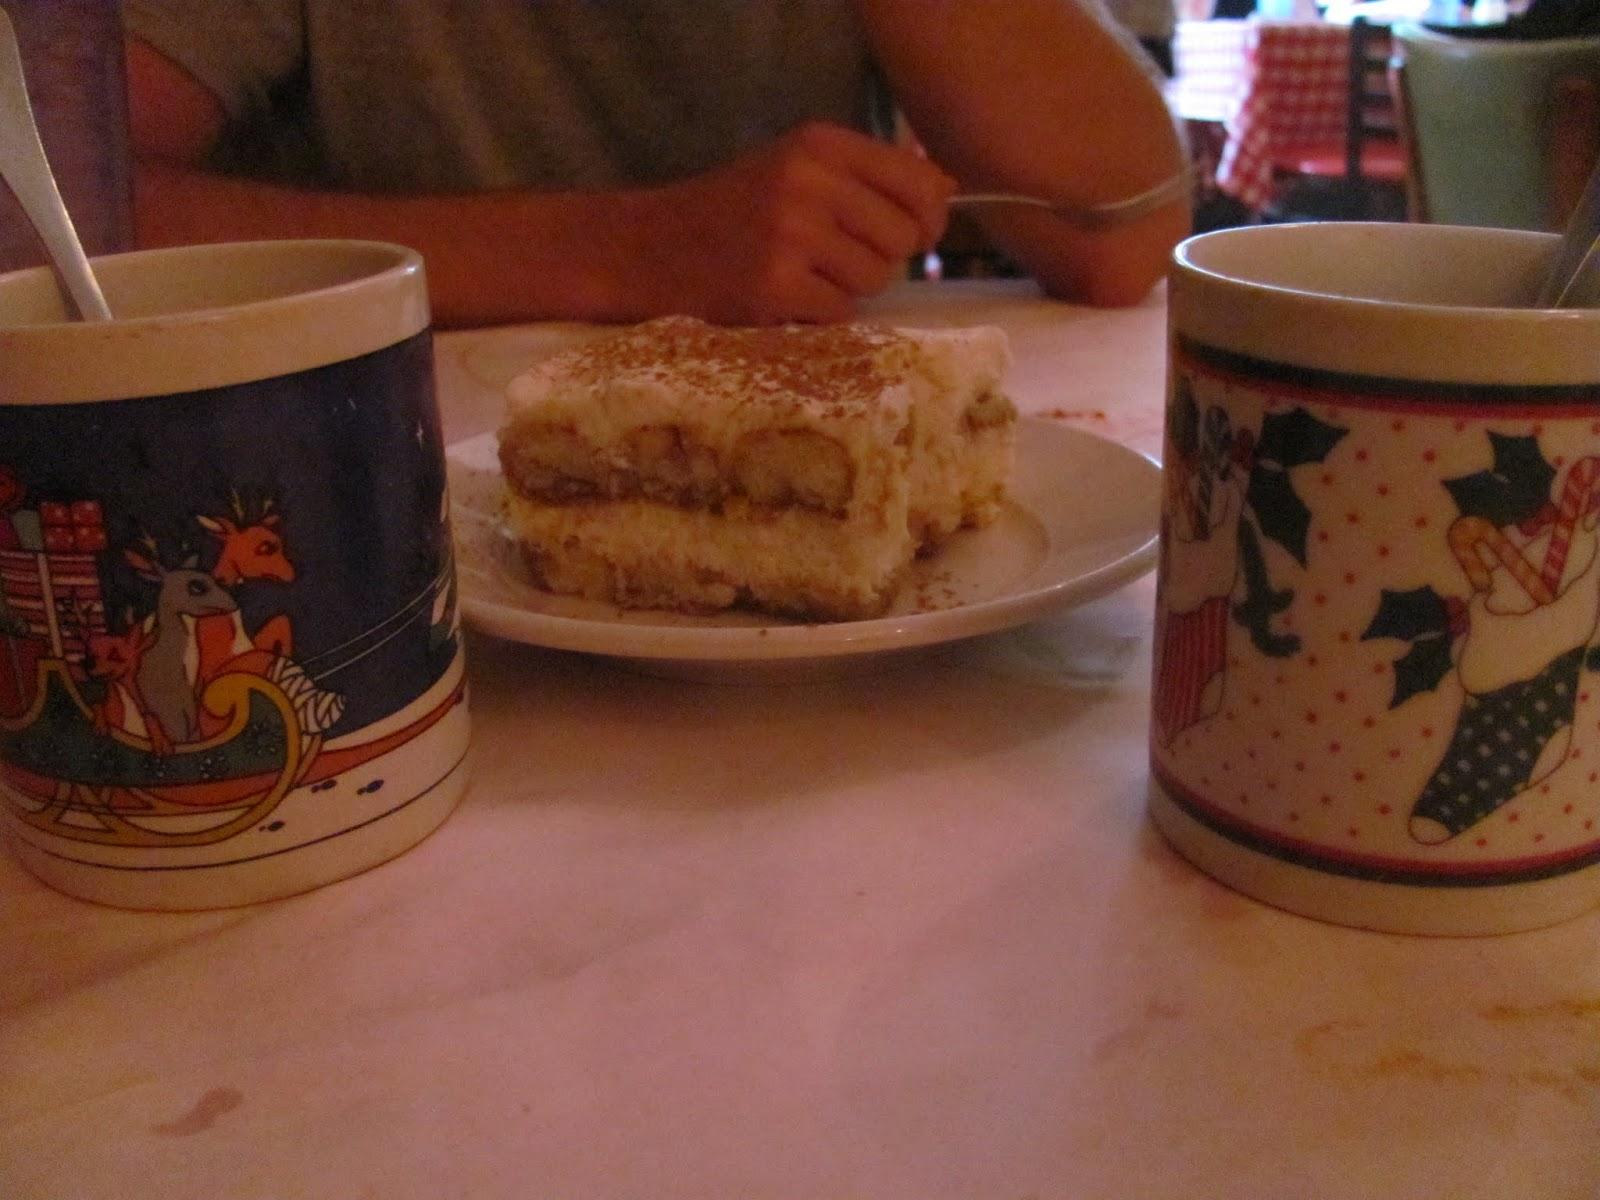 Tiramisu and coffee in Christmas-themed mugs at Mona Lisa's New Orleans, LA